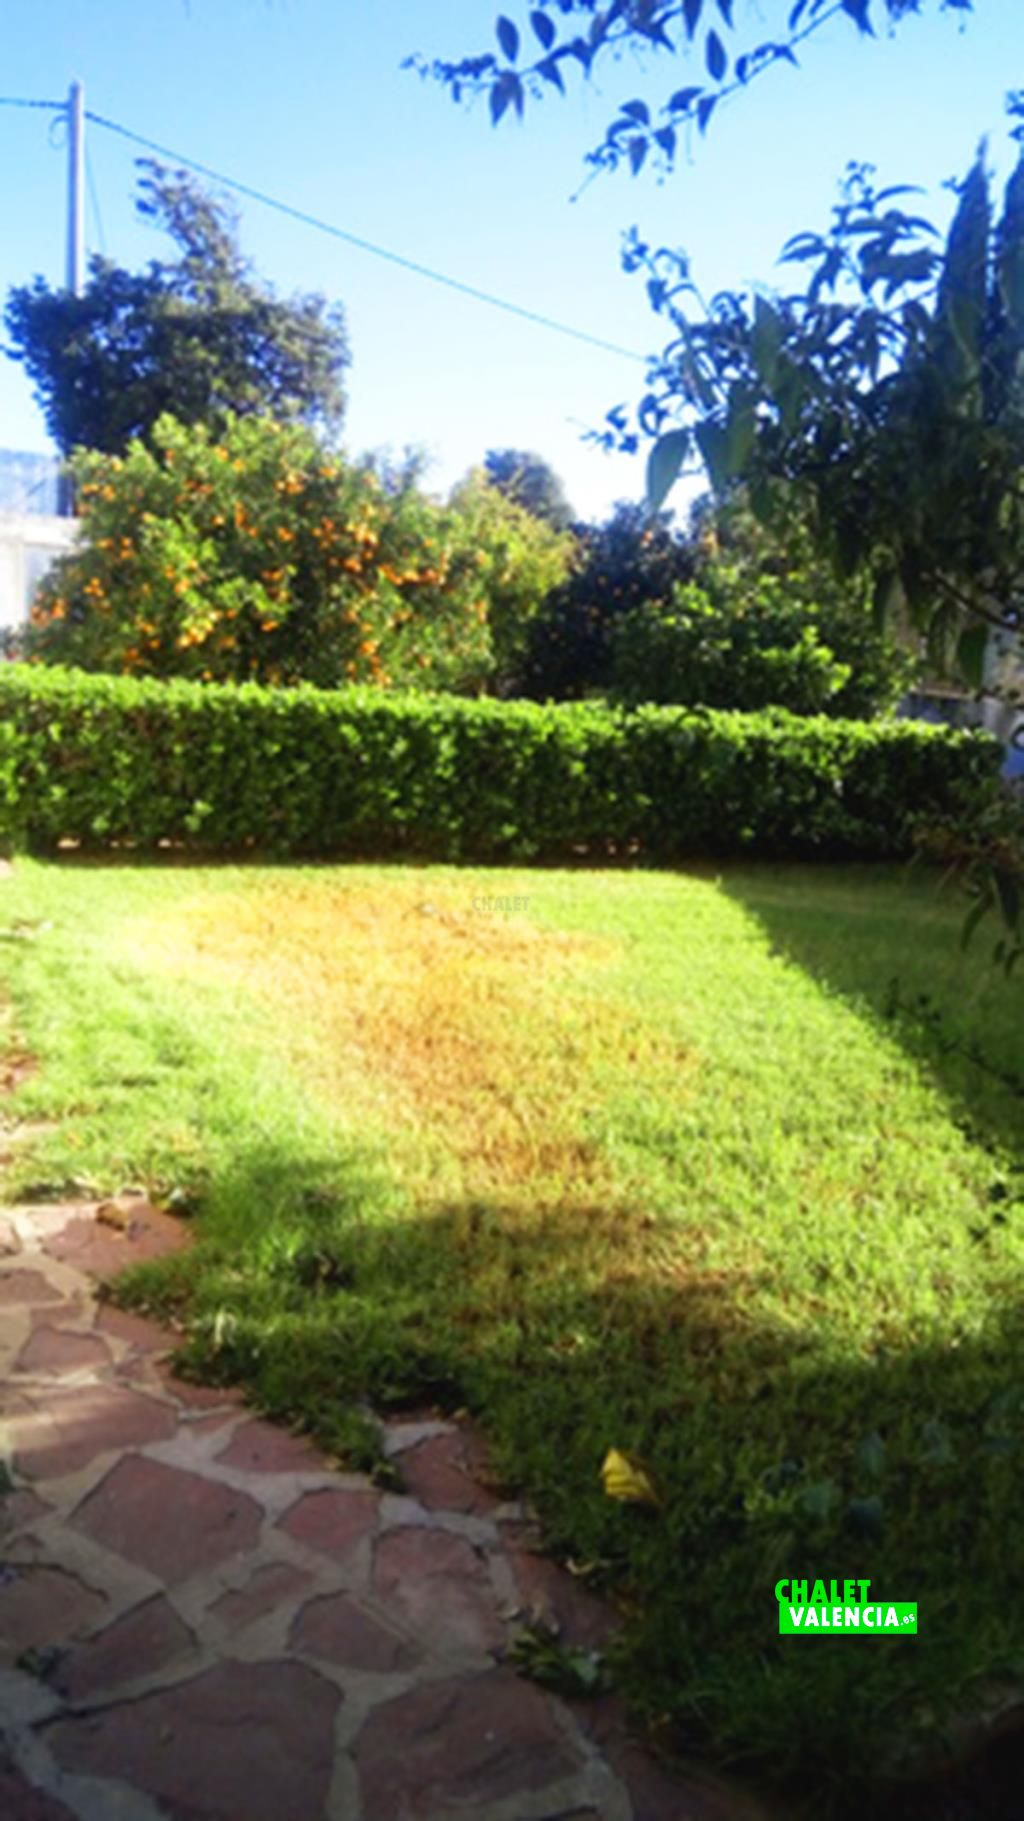 41089-jardin-chalet-valencia